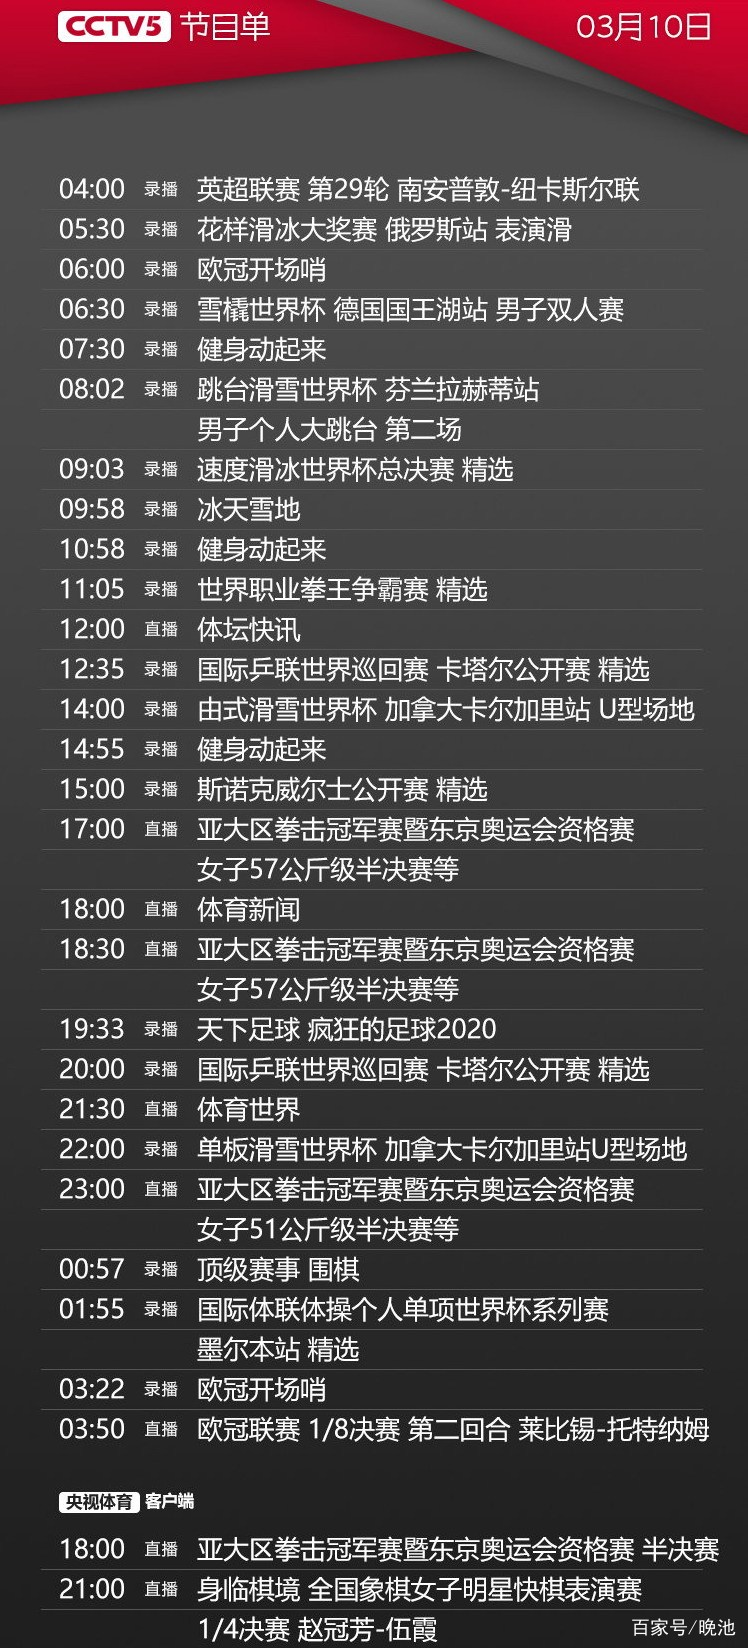 cctv5欧冠决赛录像_央视今日节目单,CCTV5直播莱比锡VS热刺+拳击奥运资格赛,5+欧冠